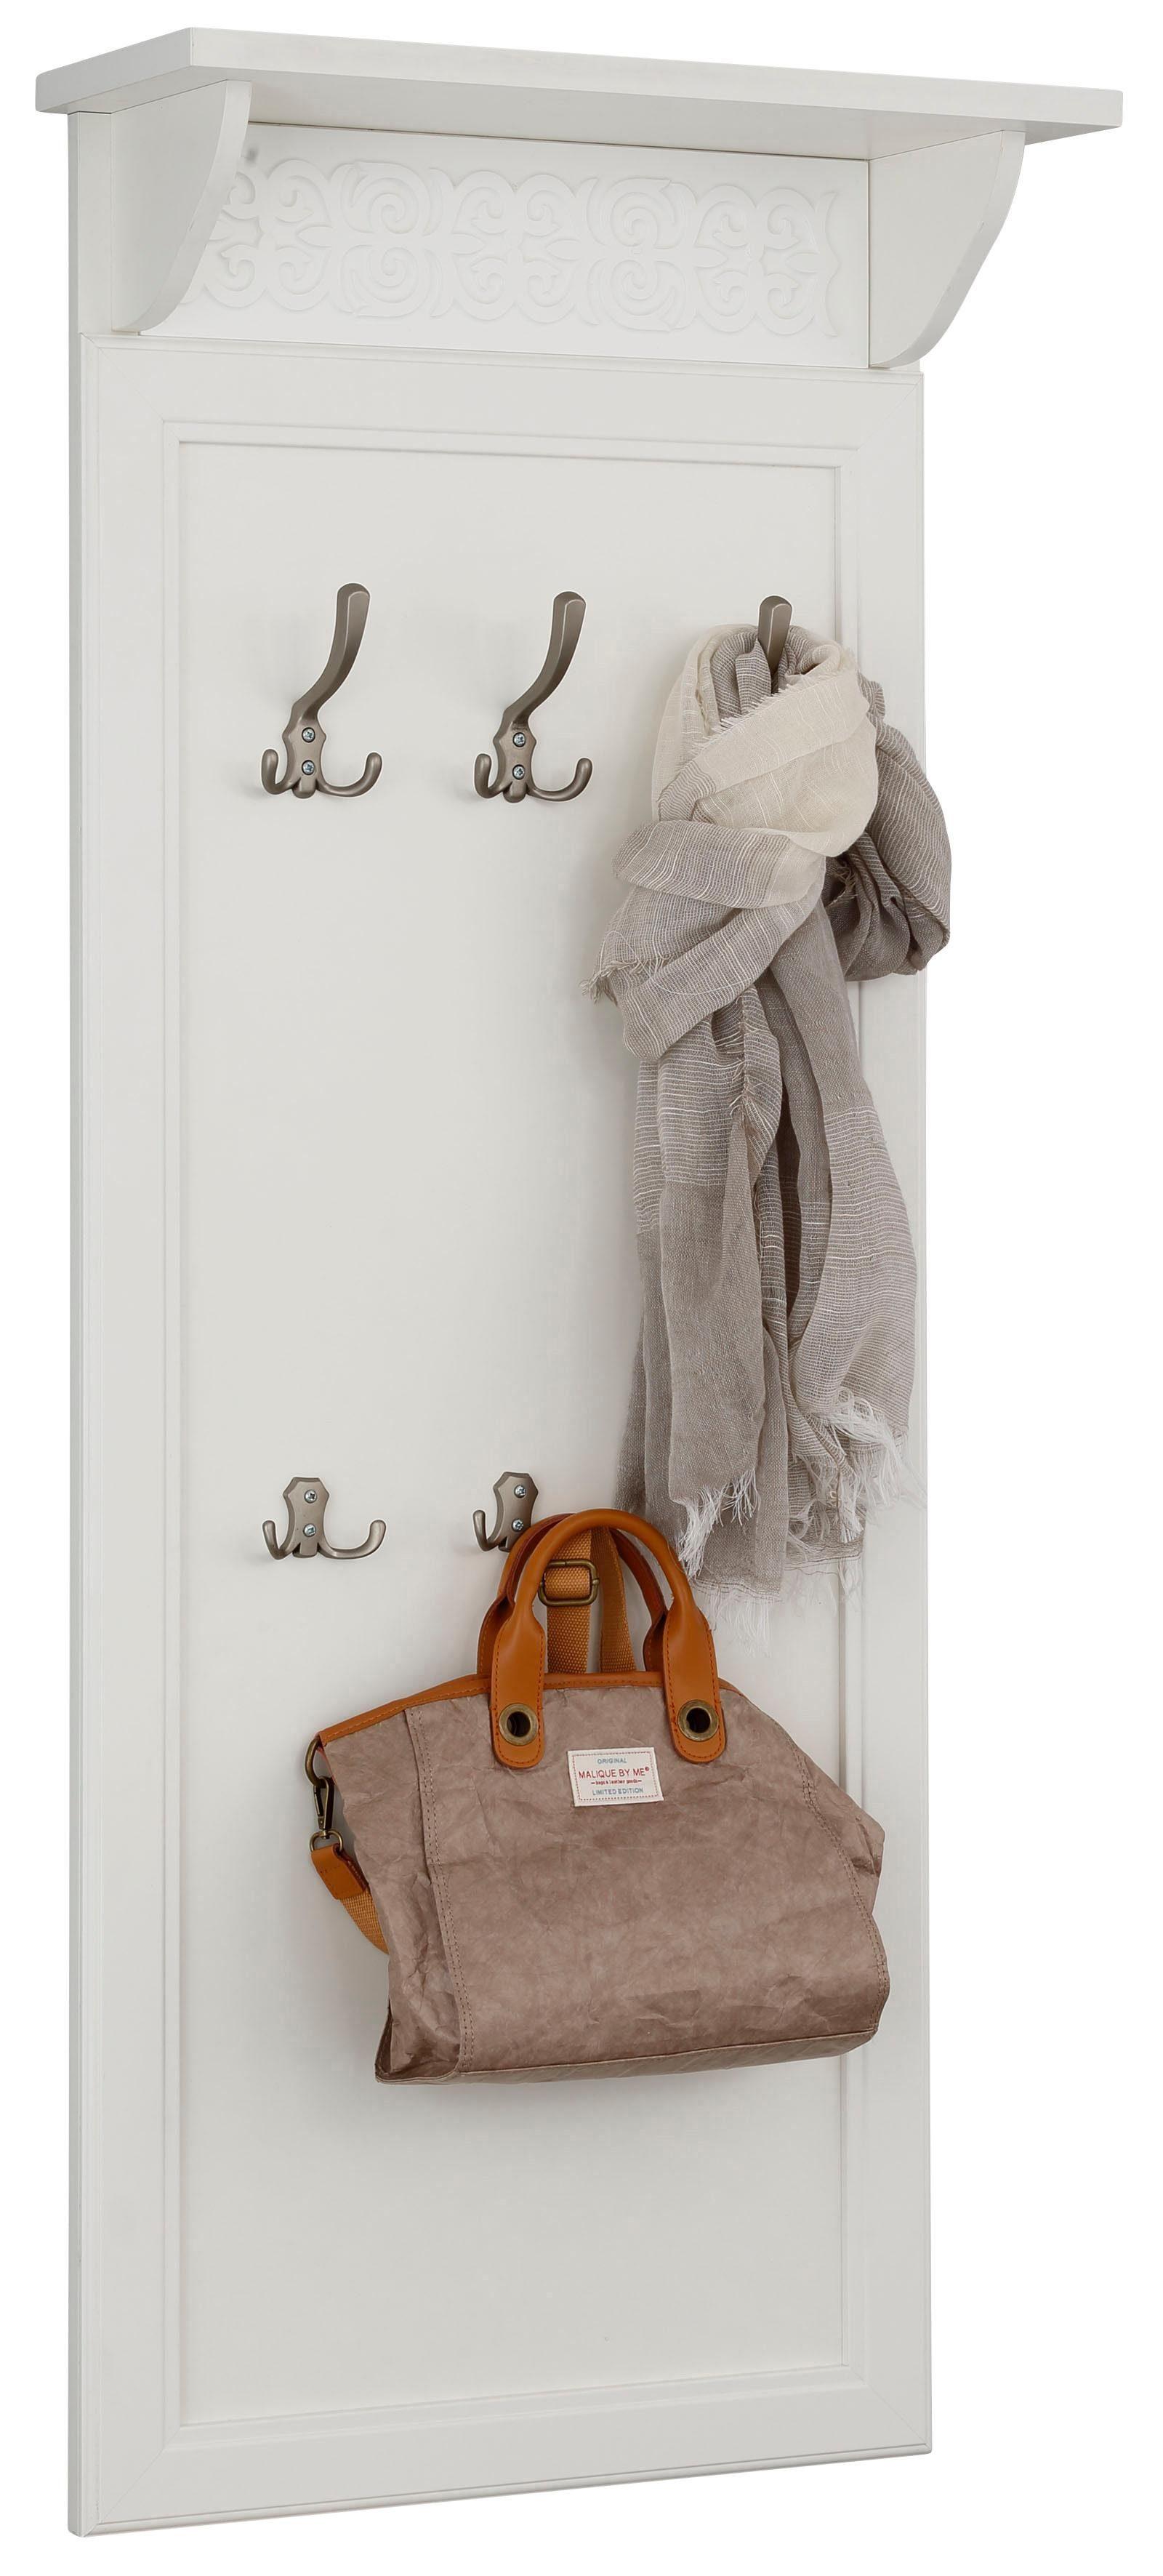 Home affaire Wandpaneel »Lucy« mit dekorativen Ornamenten verziert